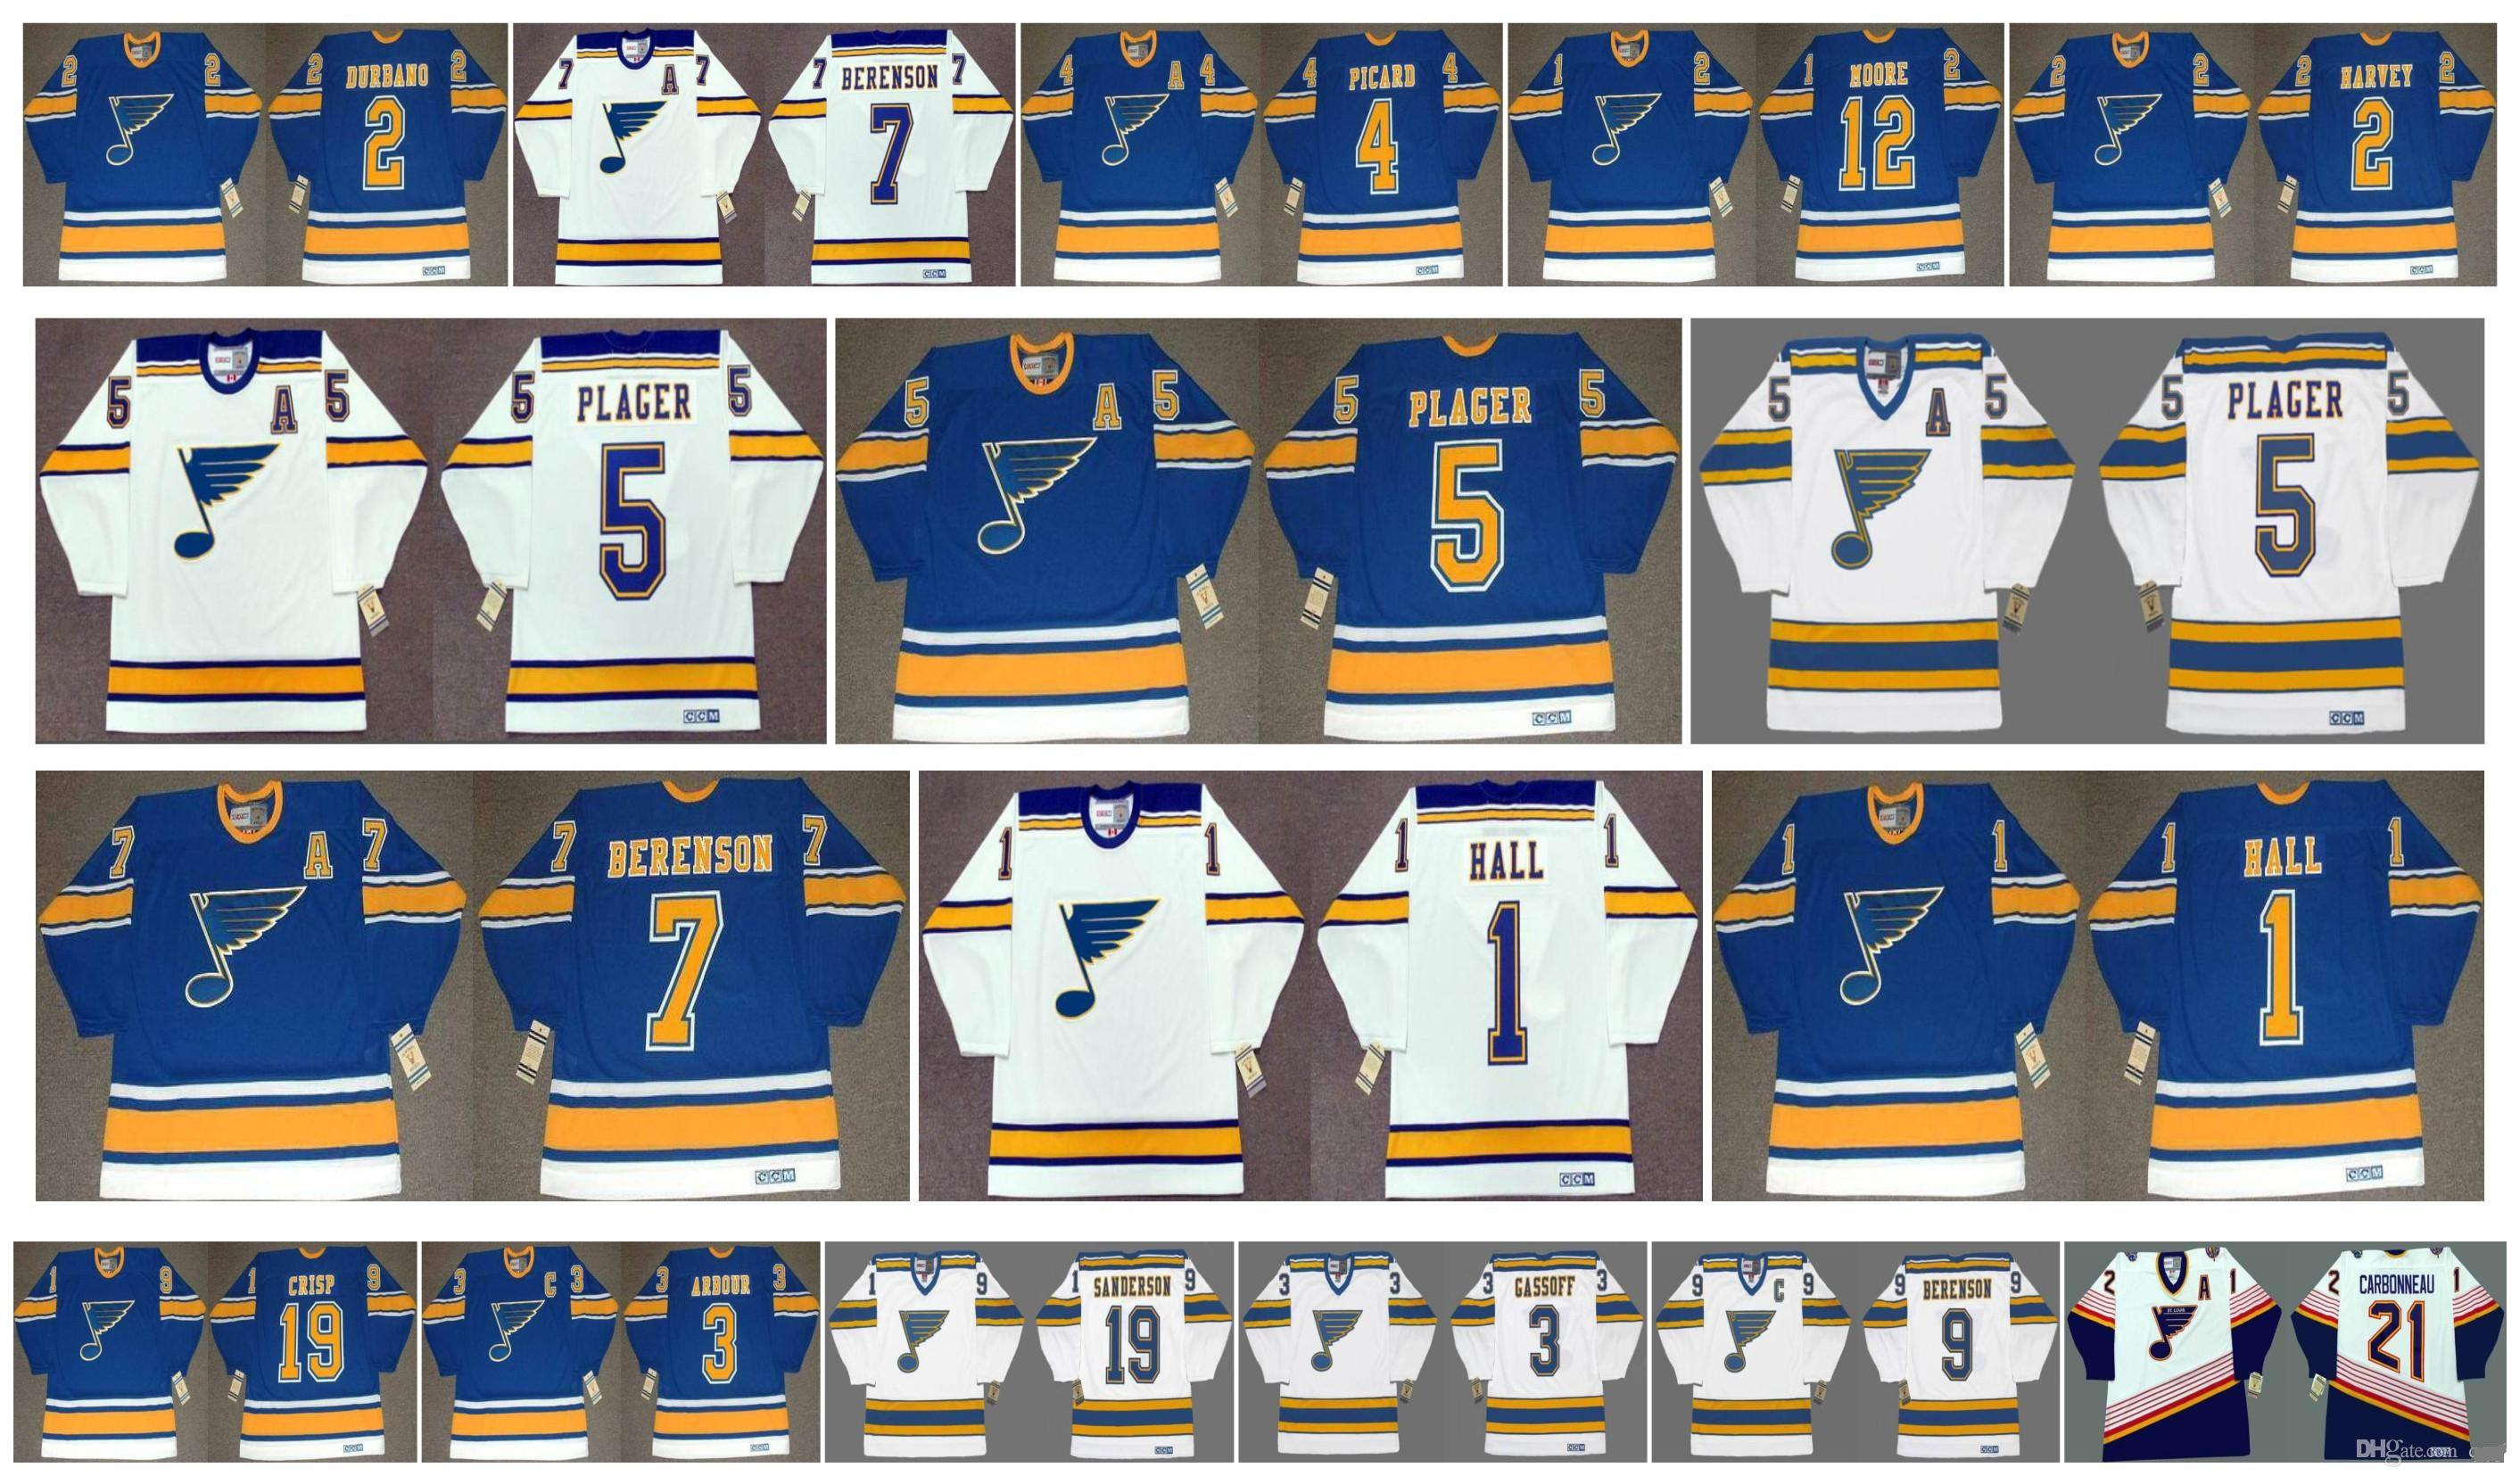 Vintage St. Louis Blues Maglie 5 Bob Plager 1 Glenn Hall 7 Red Berenson 4 Noel Picard Dickie Moore 2 Doug Harvey 2 Steve Durbano CCM Hockey